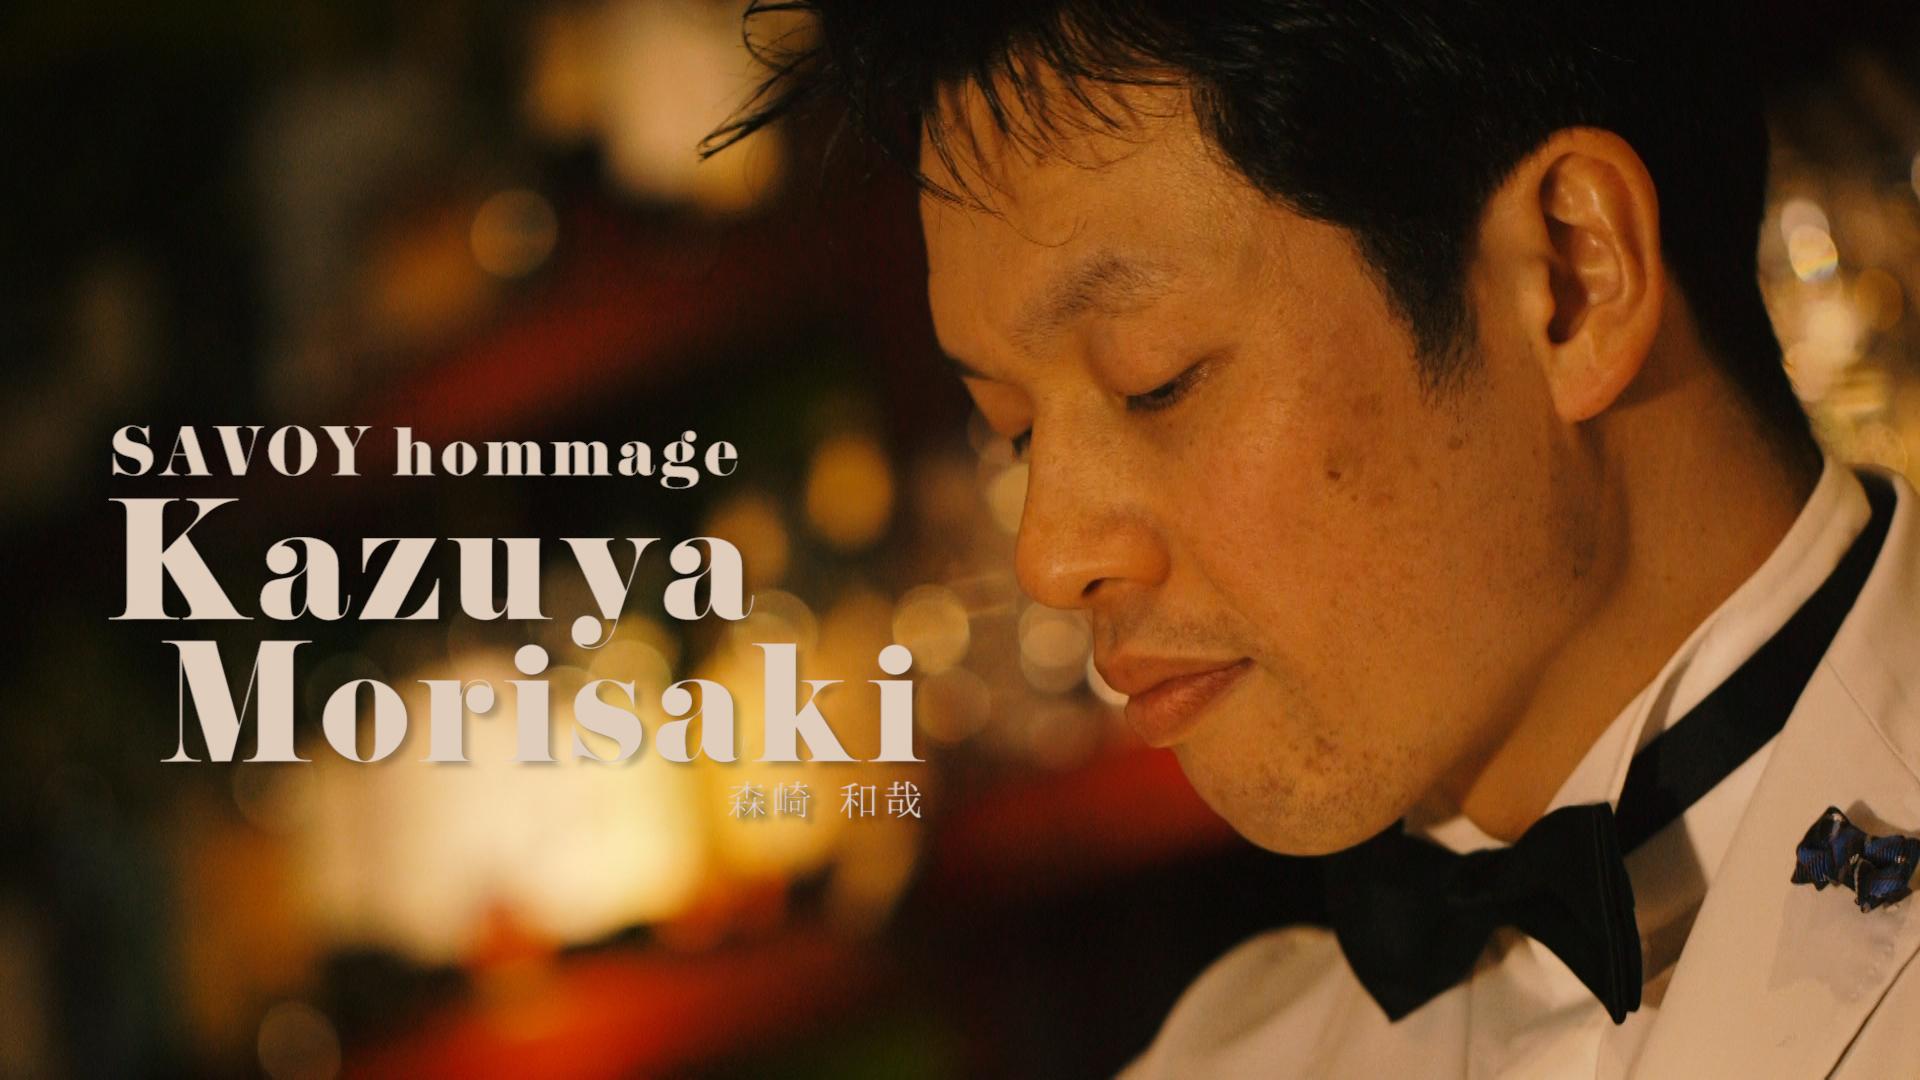 Kazuya Morisaki X Point Rouge With Camus Cognac.